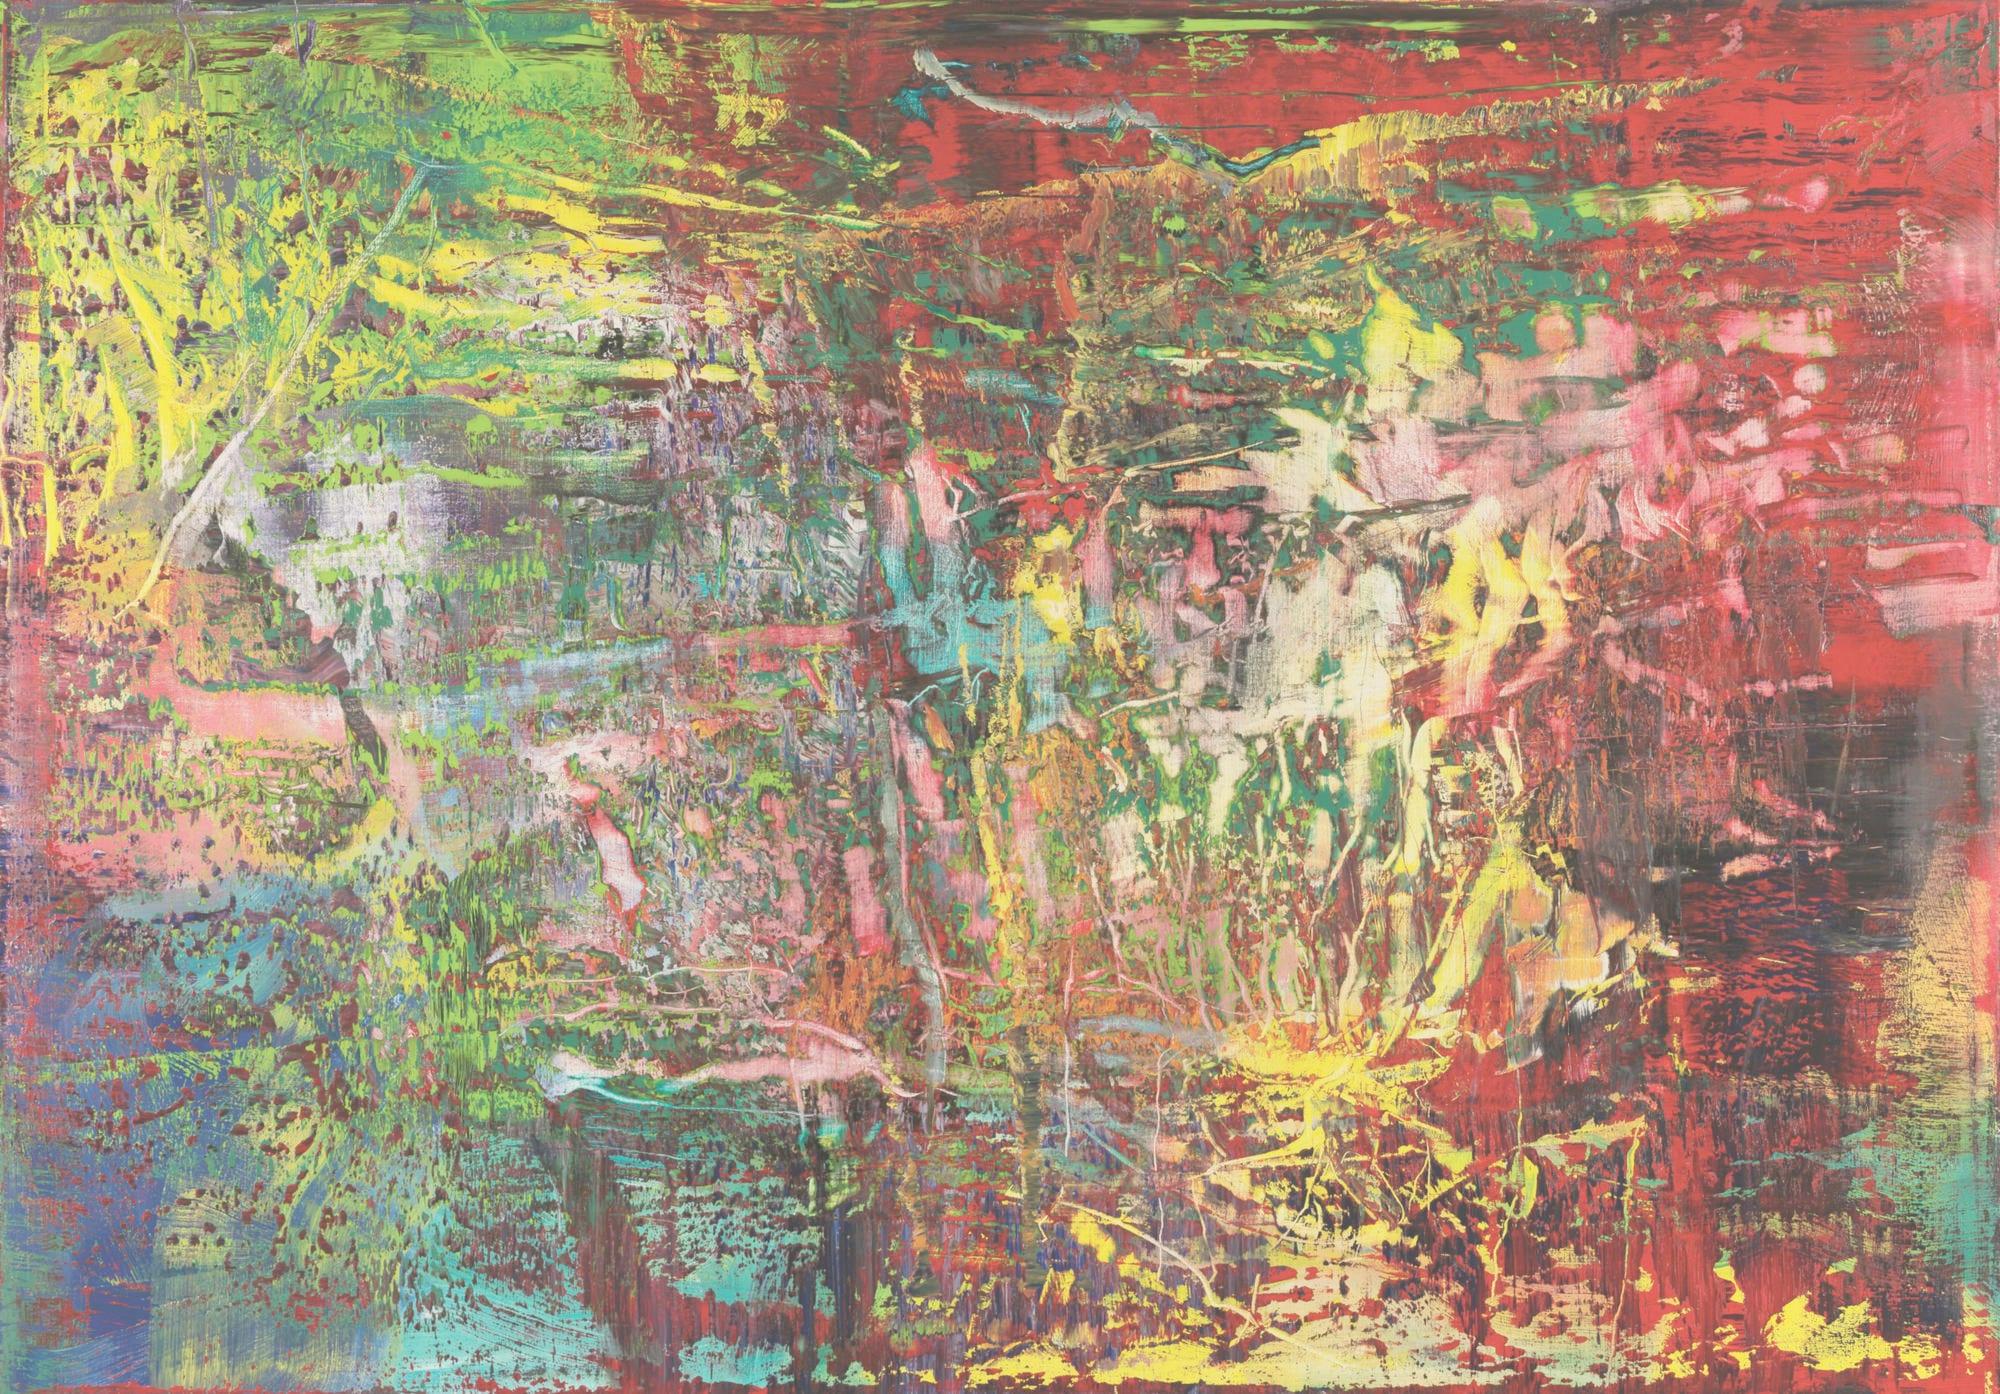 Концерт минималиста Стива Райха под сопровождение картин Герхарда Рихтера.